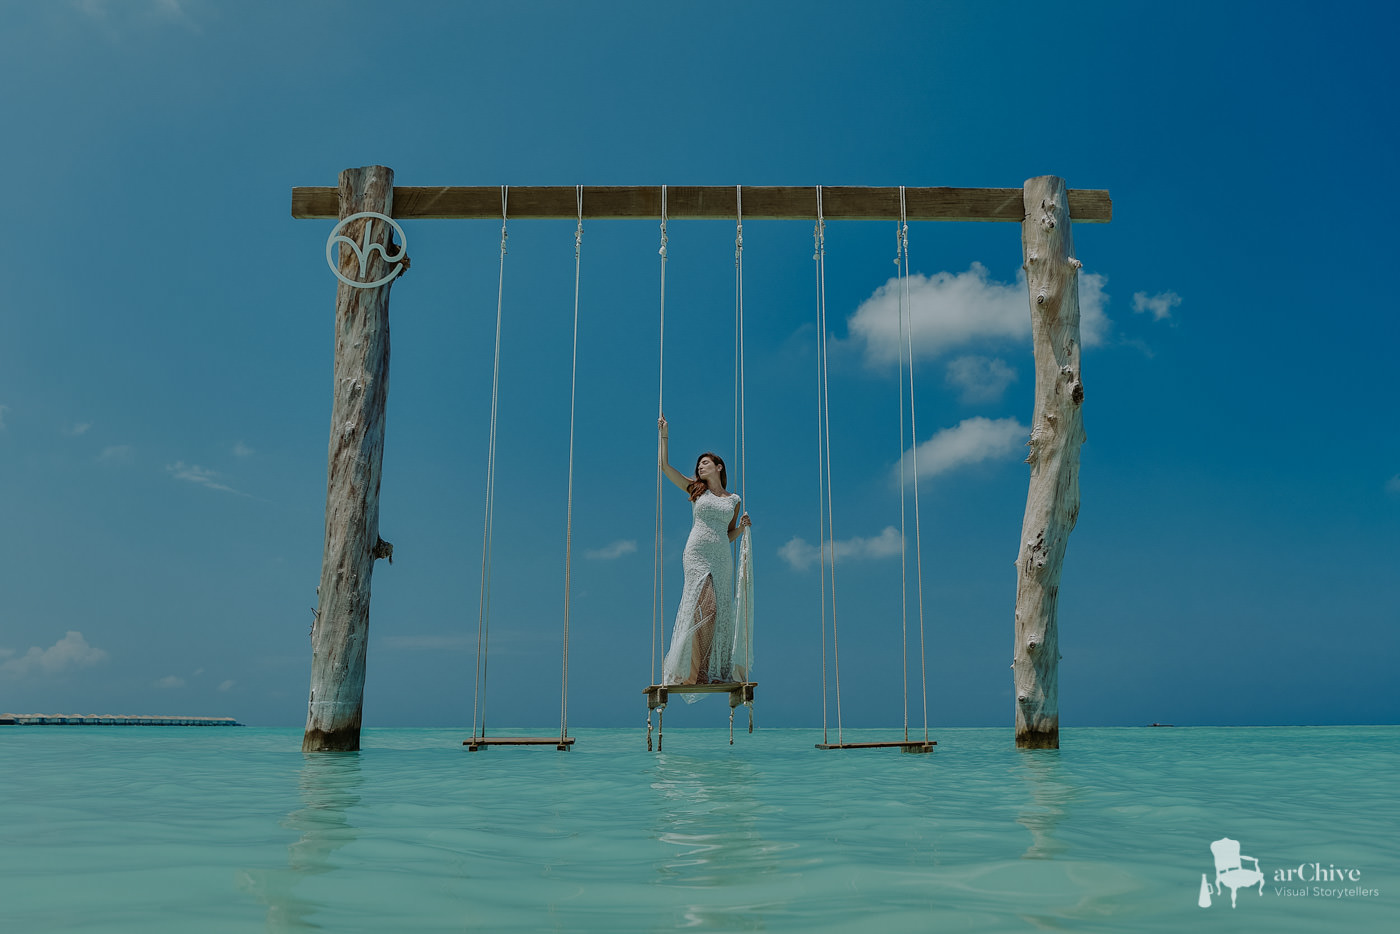 maldives editorial photographer